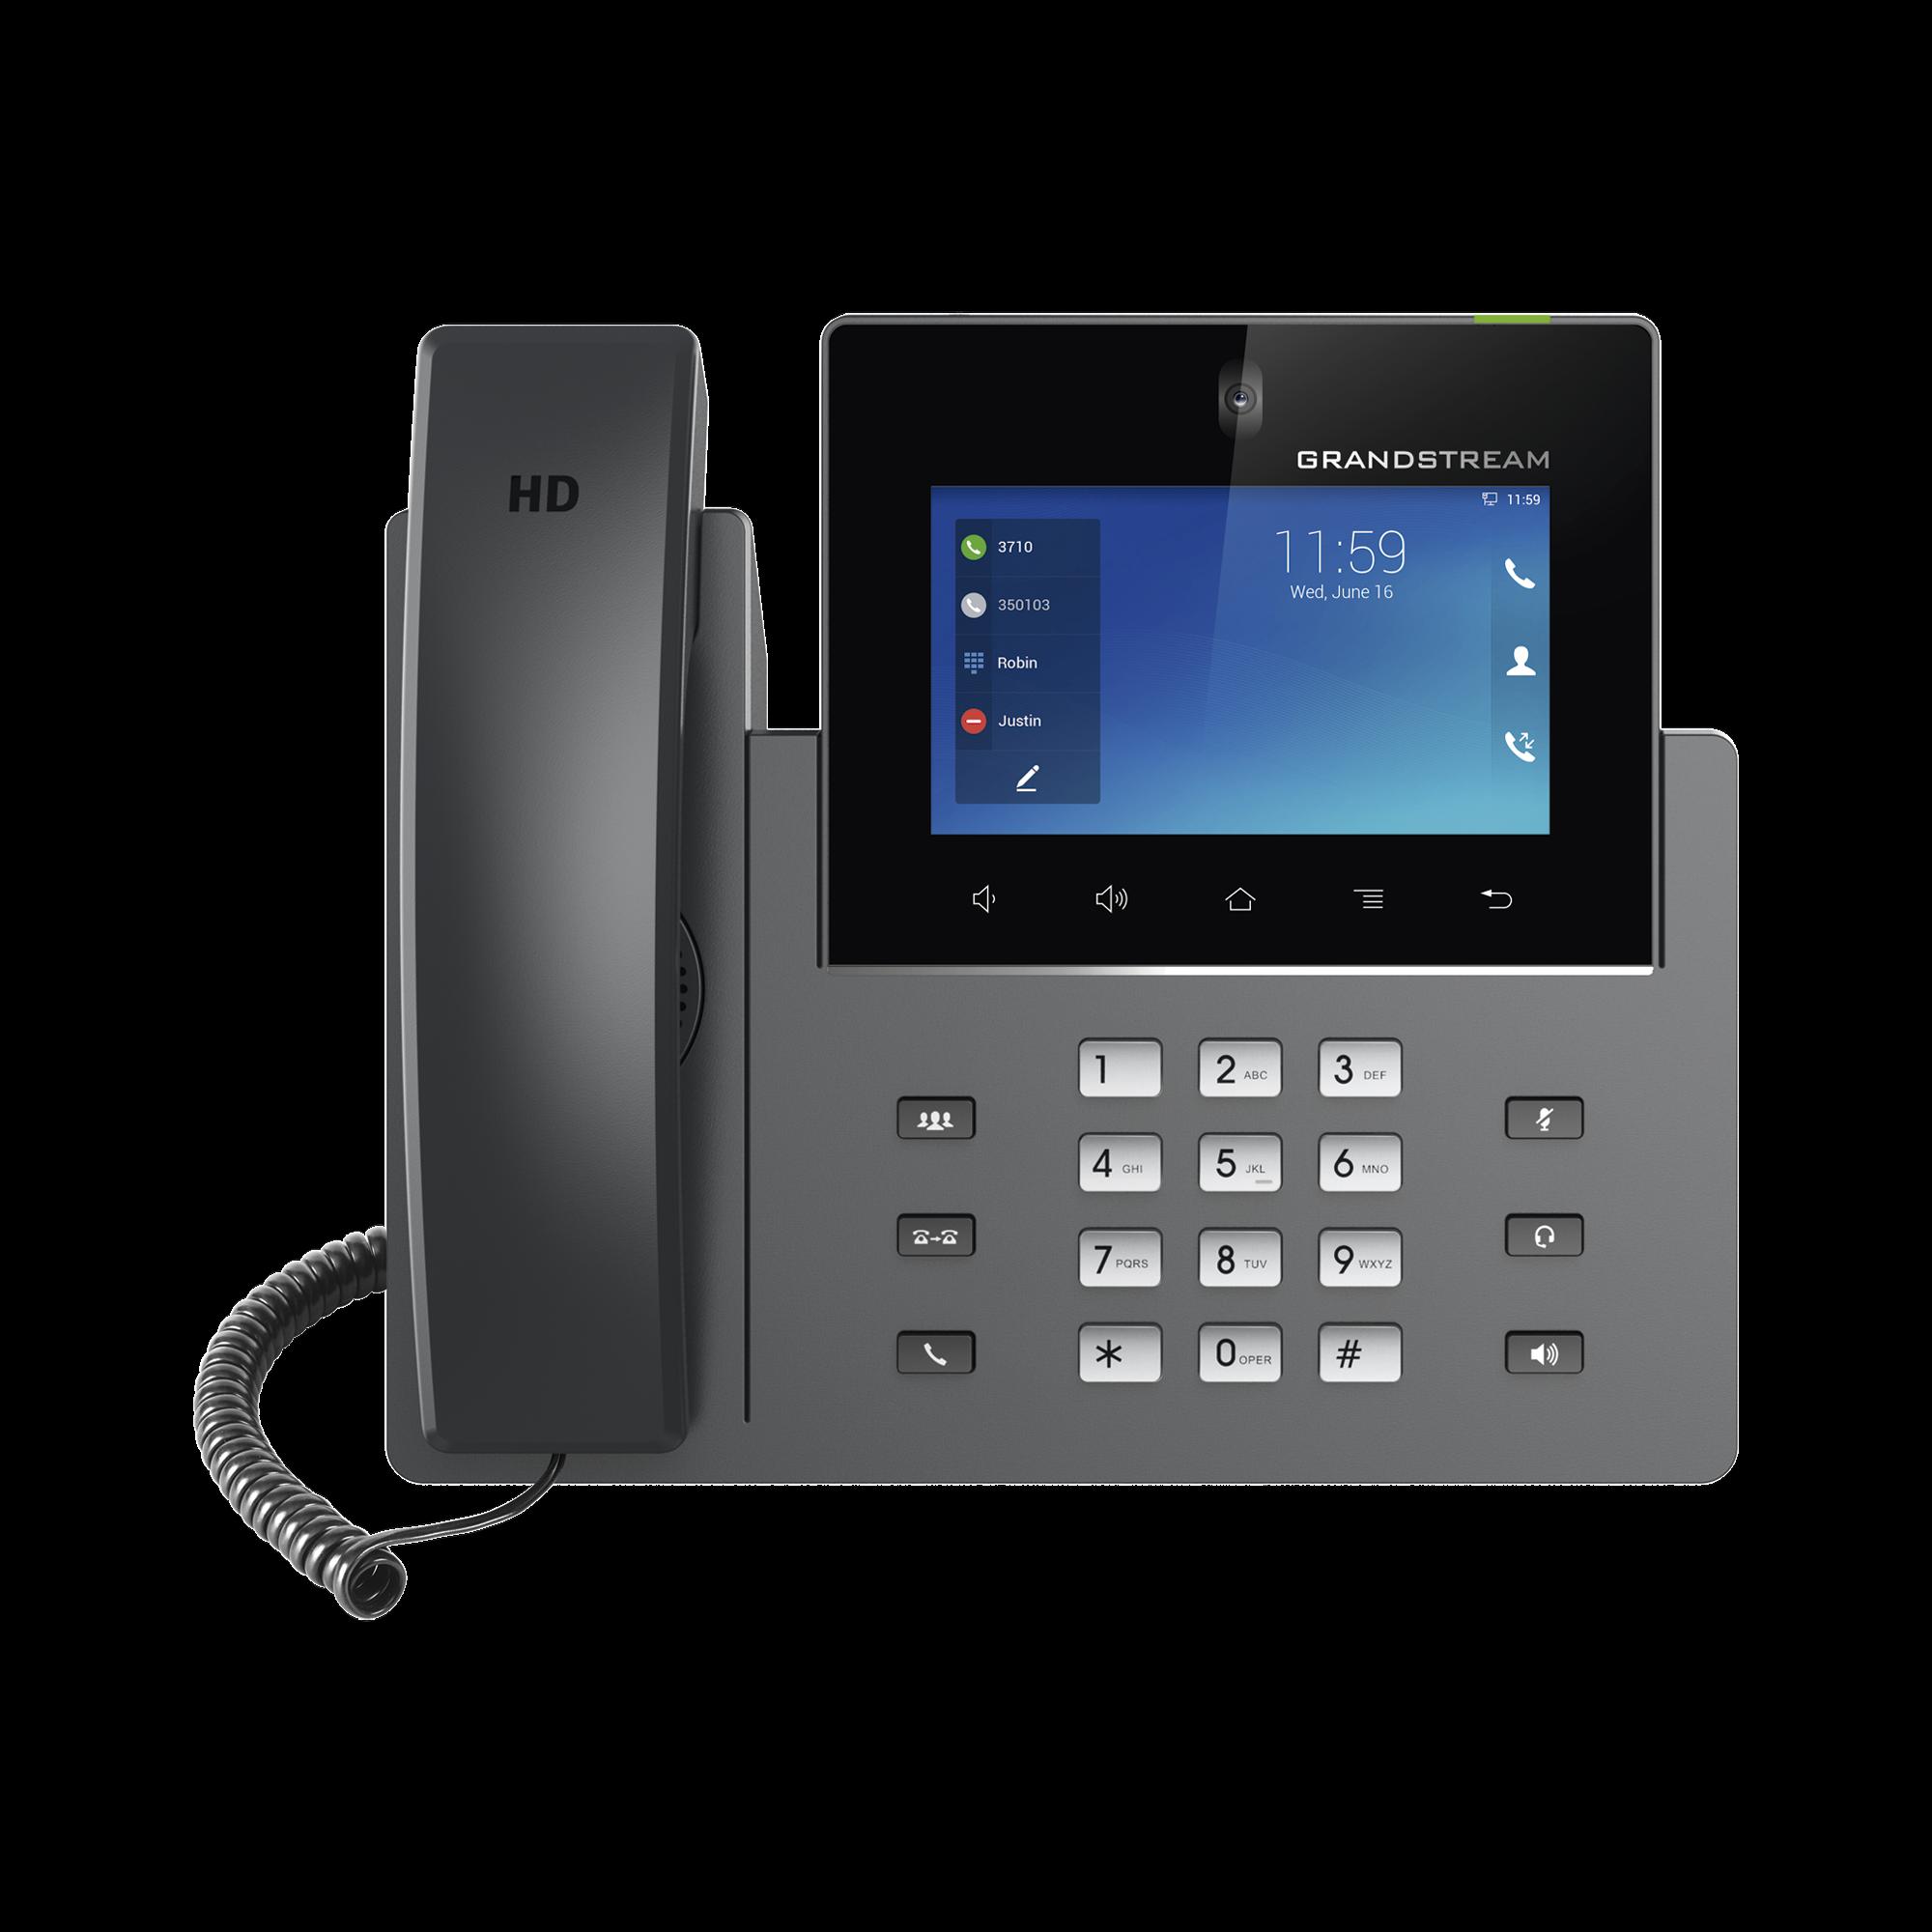 Videoteléfono IP pantalla táctil con android de 16 líneas, doble puerto Gigabit, PoE/PoE+